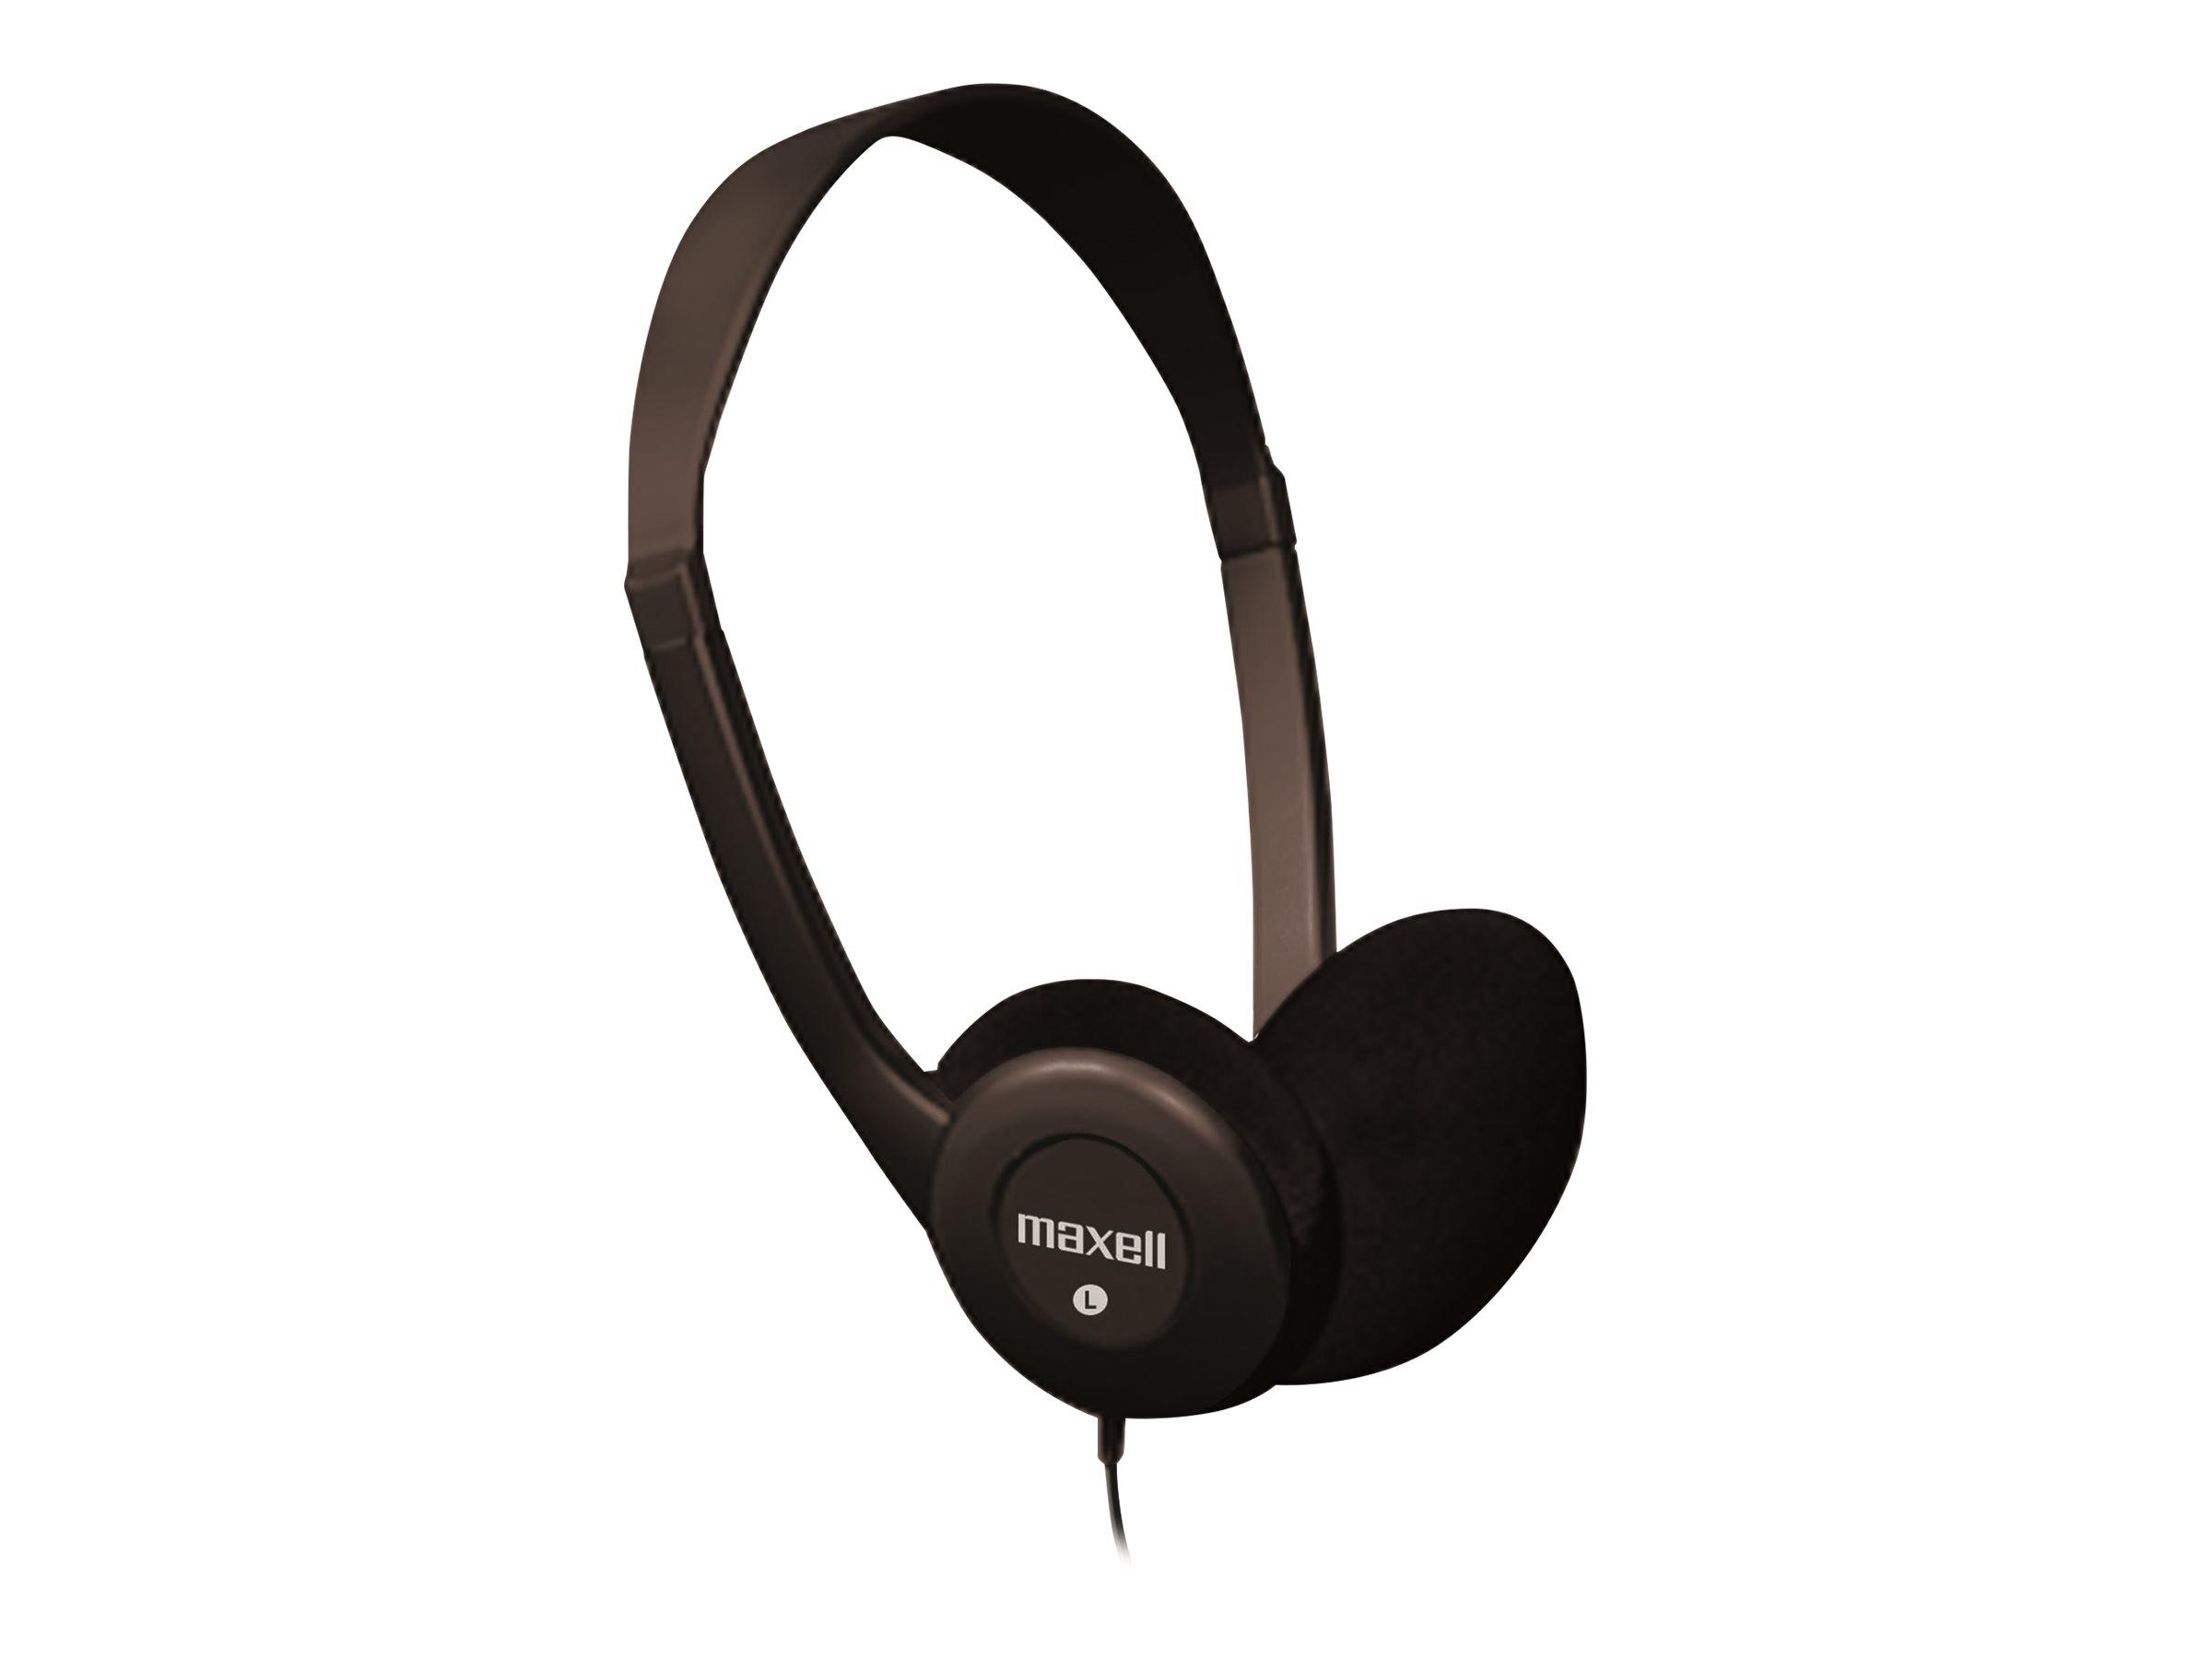 Maxell HP 100 - headphones